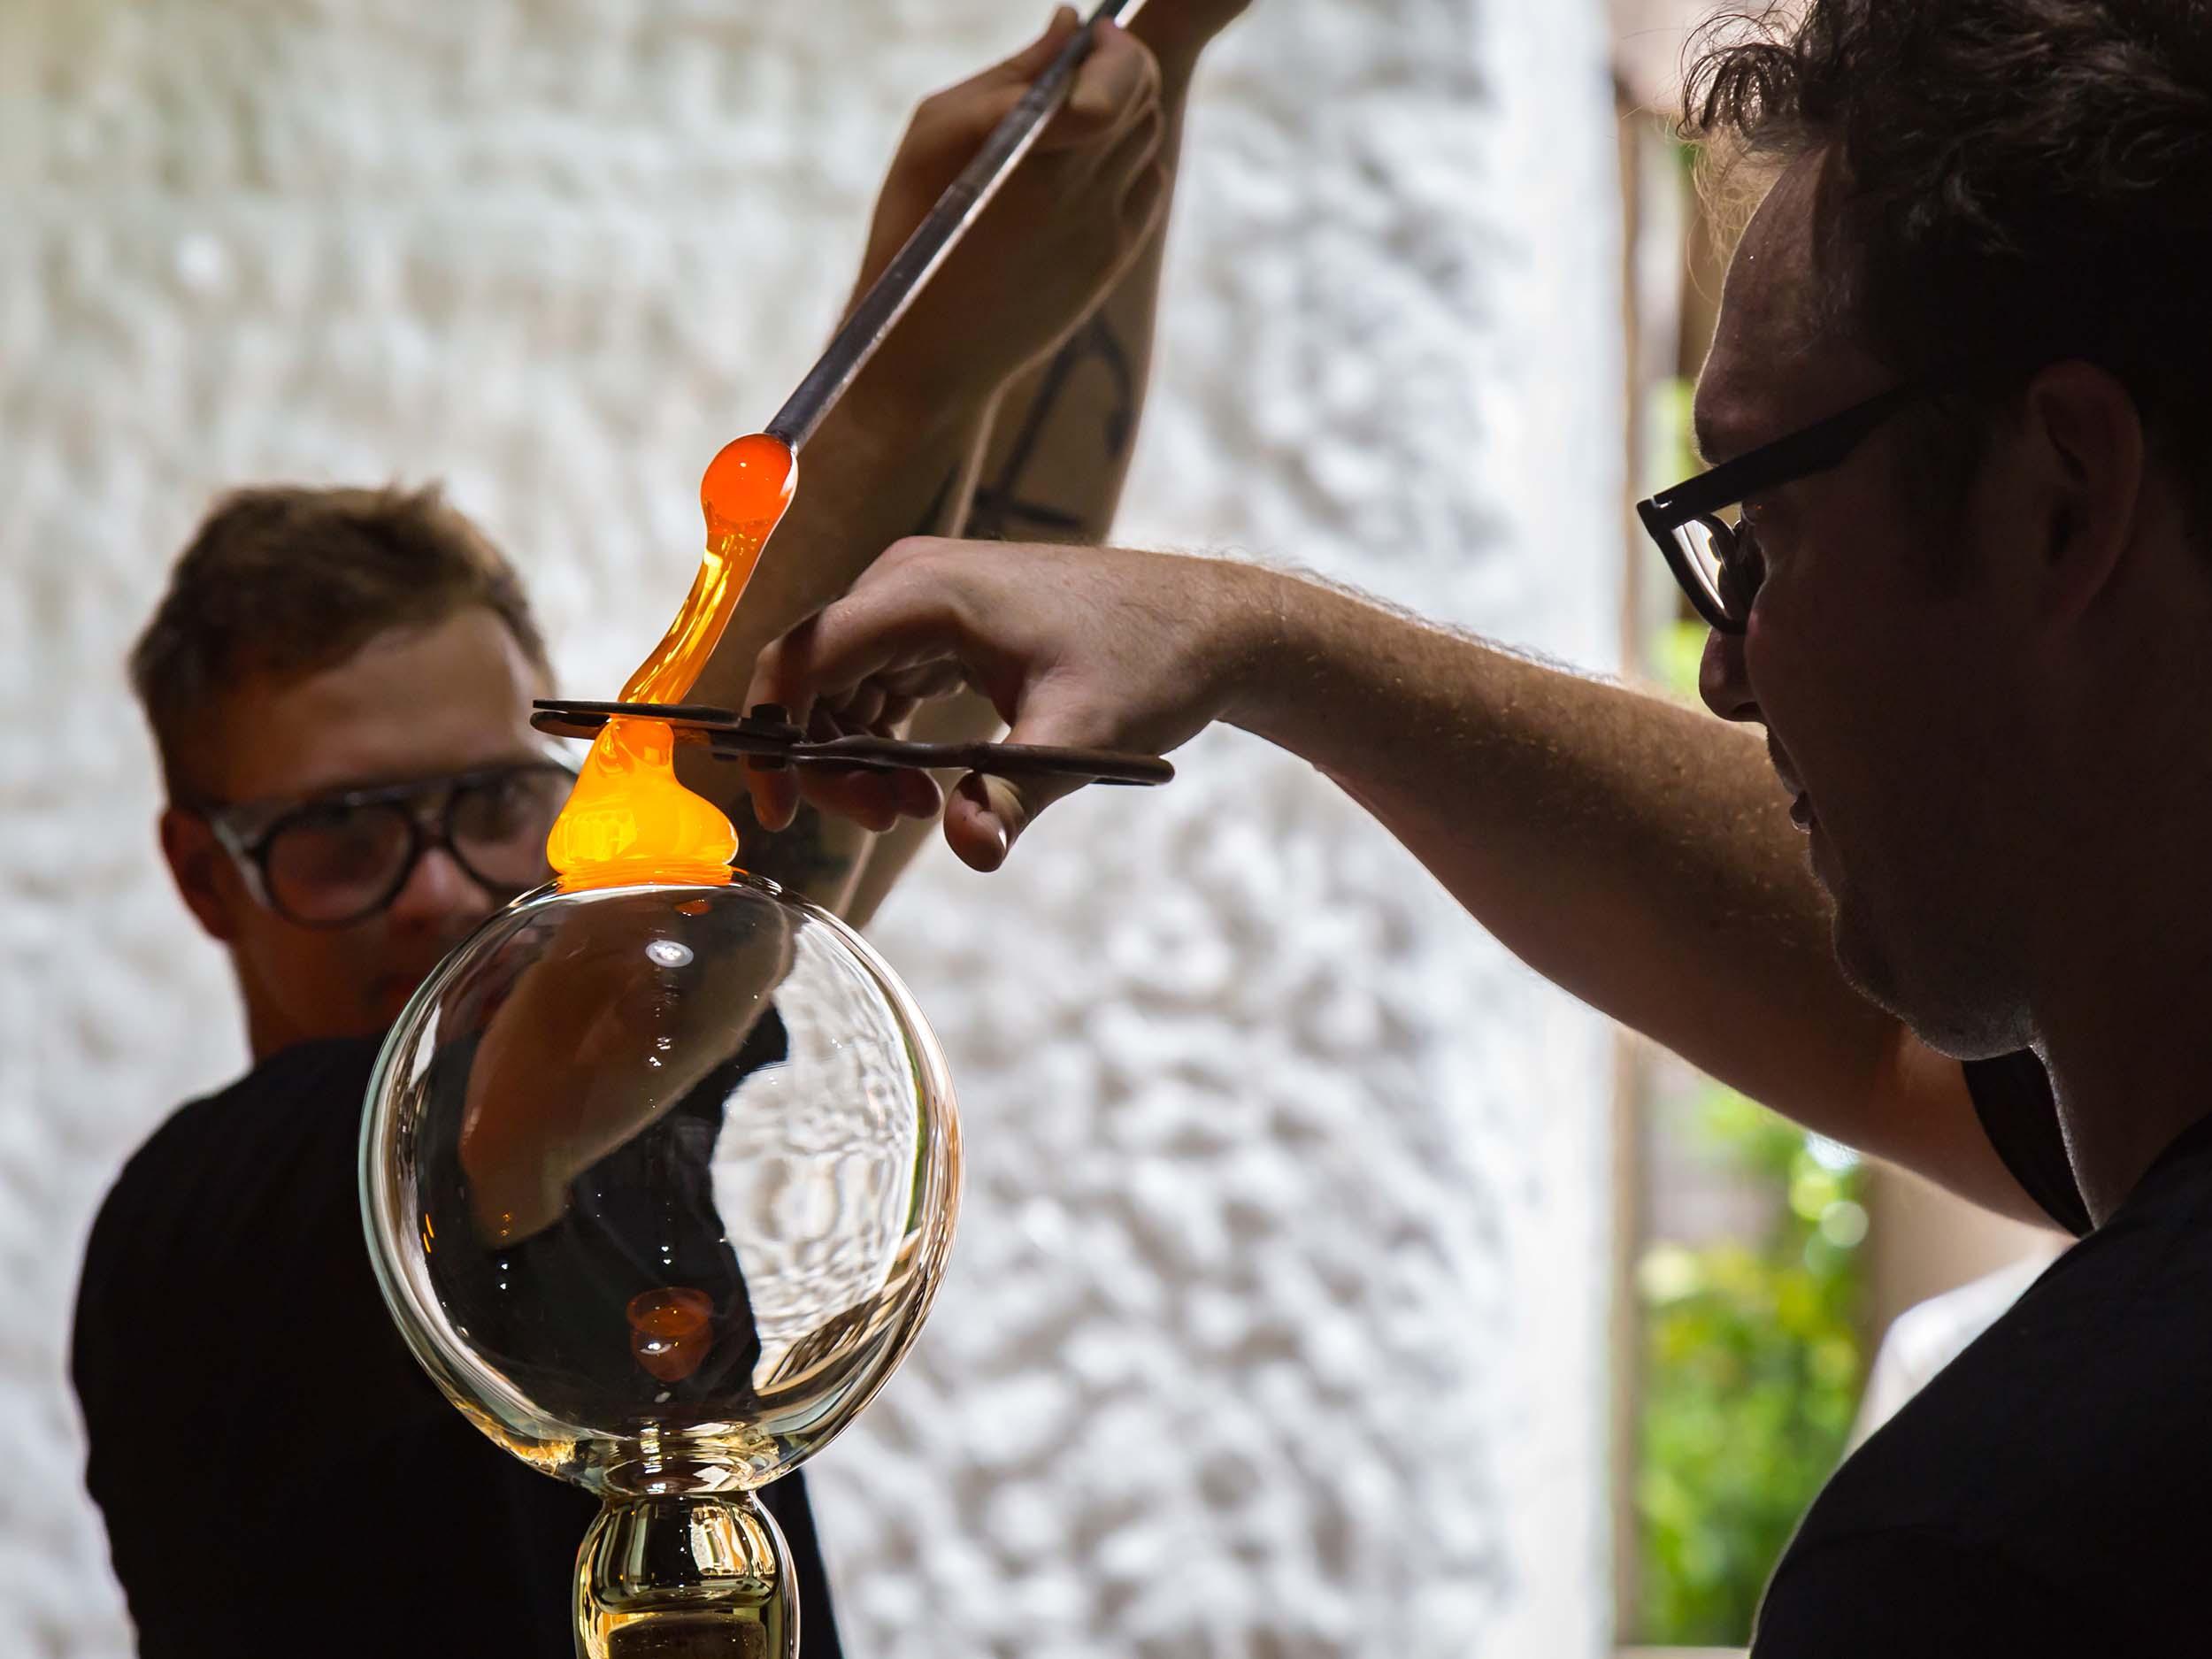 glassblowing soneva fushi maldives